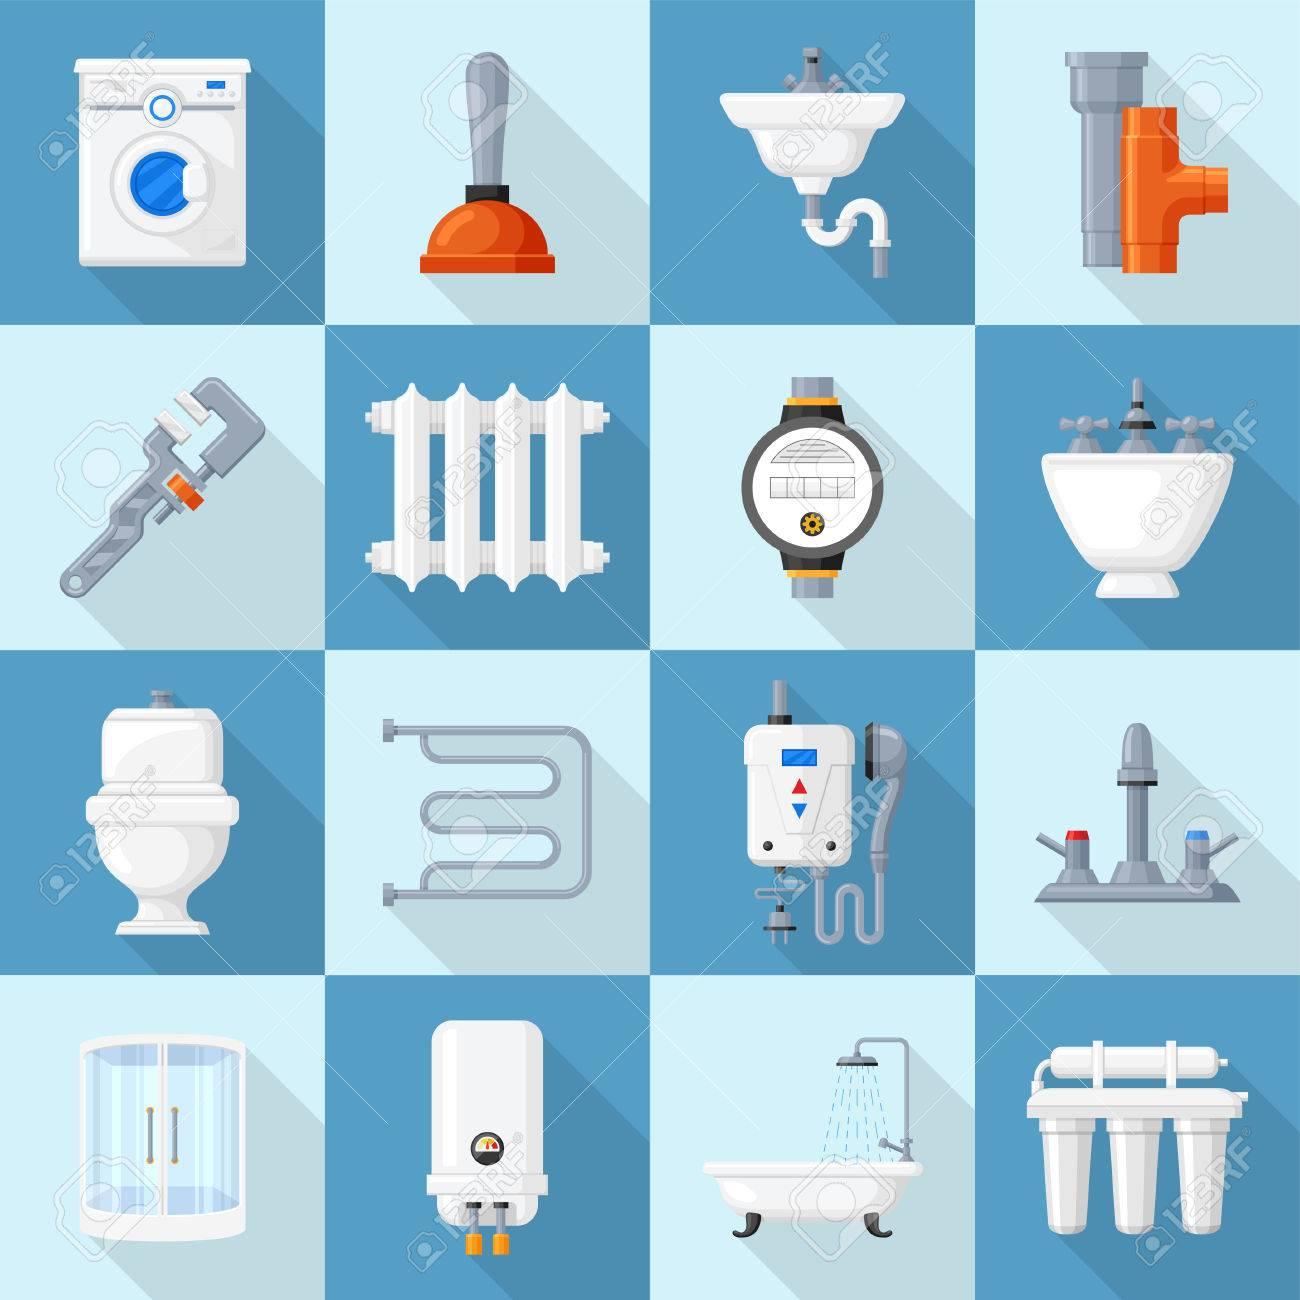 plumbing cartoon set supplies and fixtures service for home